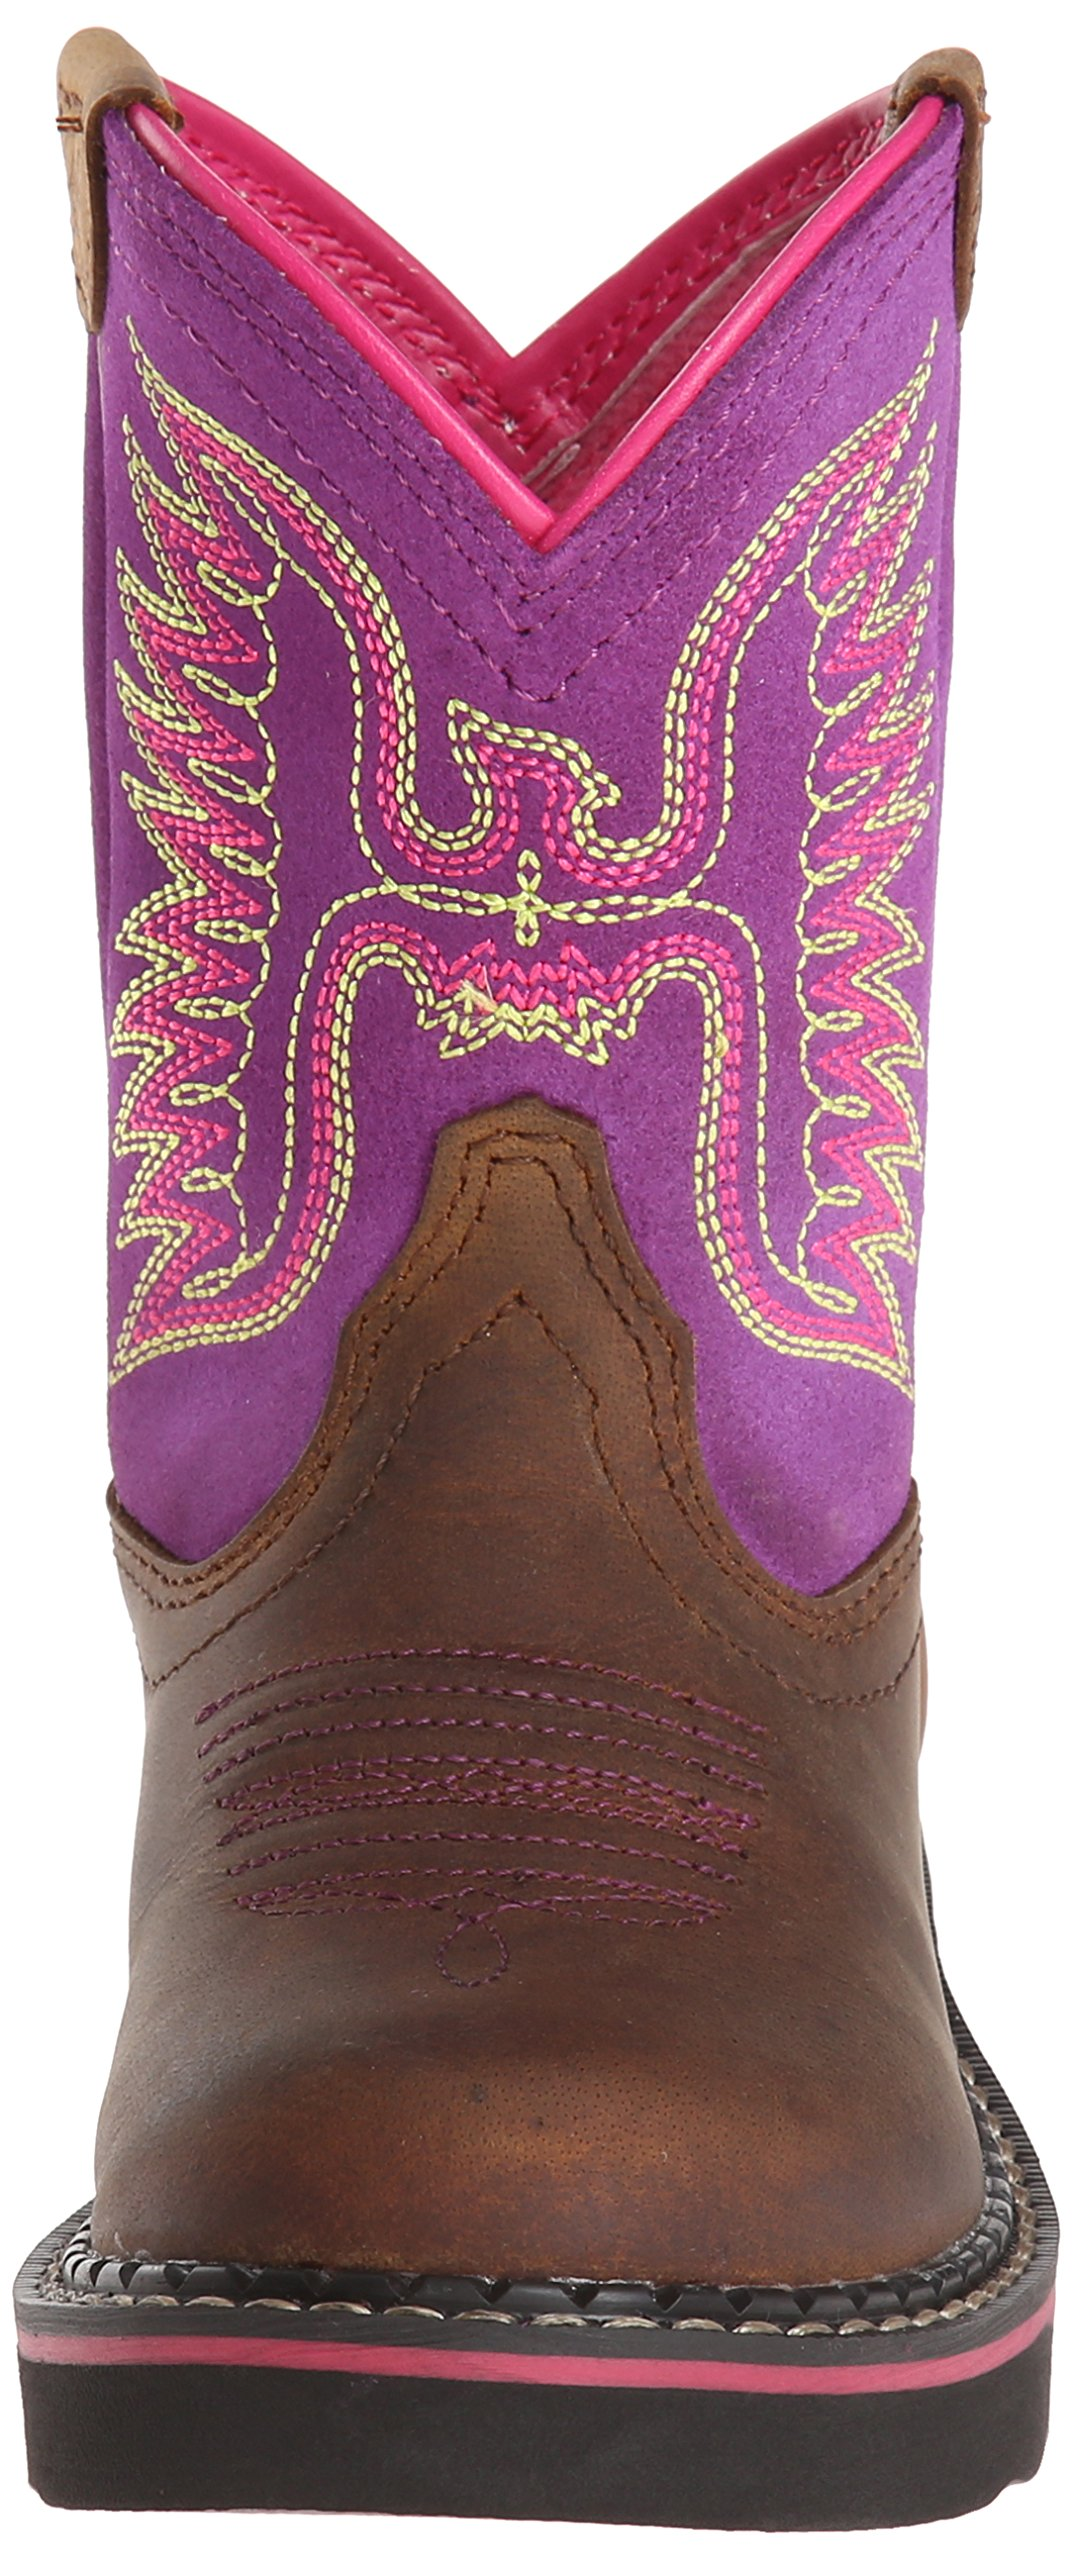 Kids' Fatbaby Thunderbird Western Cowboy Boot, Powder Brown/Amethyst, 12.5 M US Little Kid by ARIAT (Image #4)